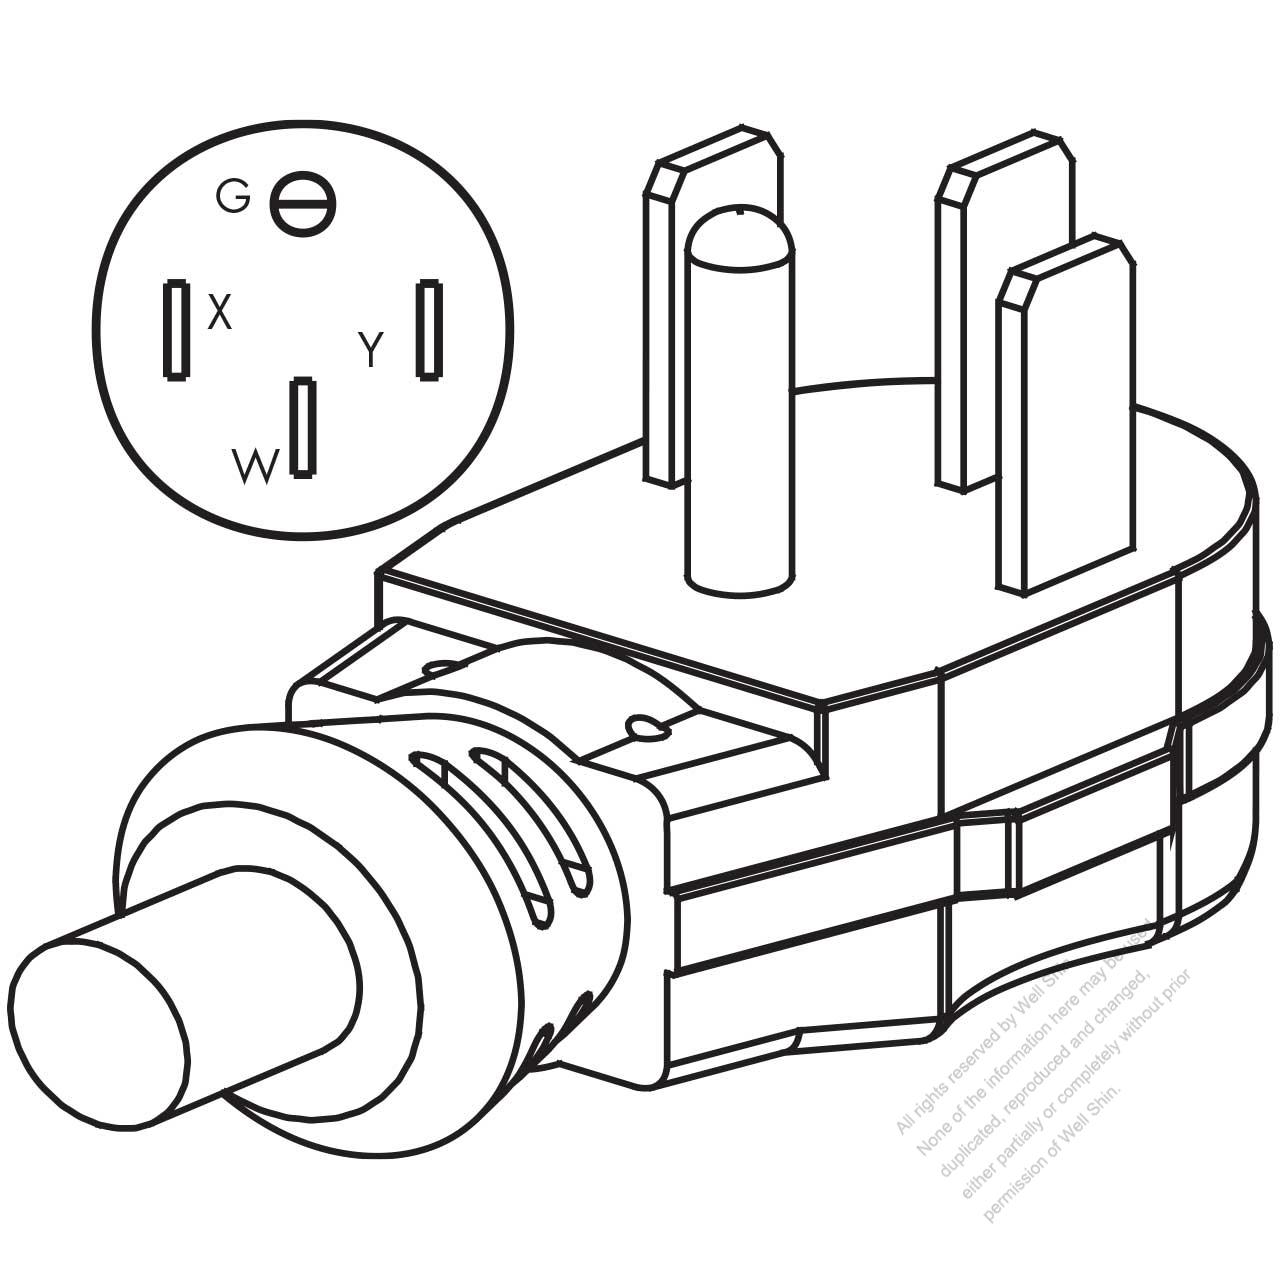 50 amp generator plug wiring diagram wirdig wire 50 rv plug diagram 50 amp rv receptacle 50 amp camper plug